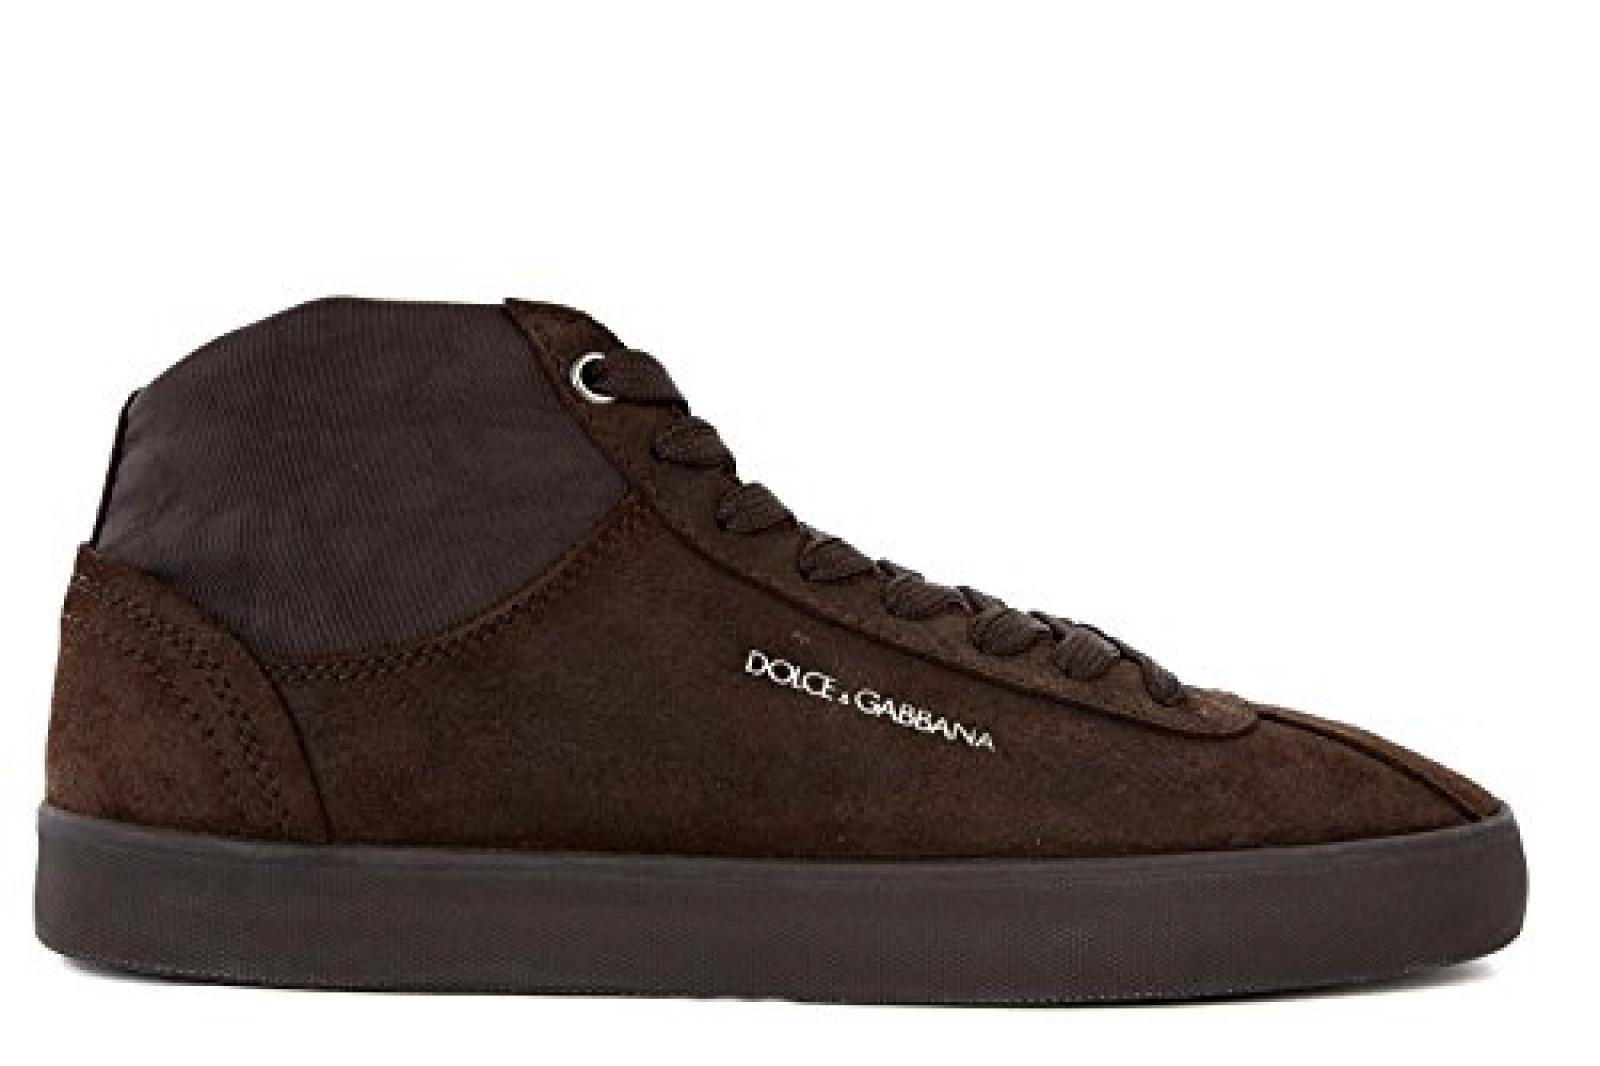 DOLCE&GABBANA Herrenschuhe Herren Wildleder Schuhe High Sneakers Braun